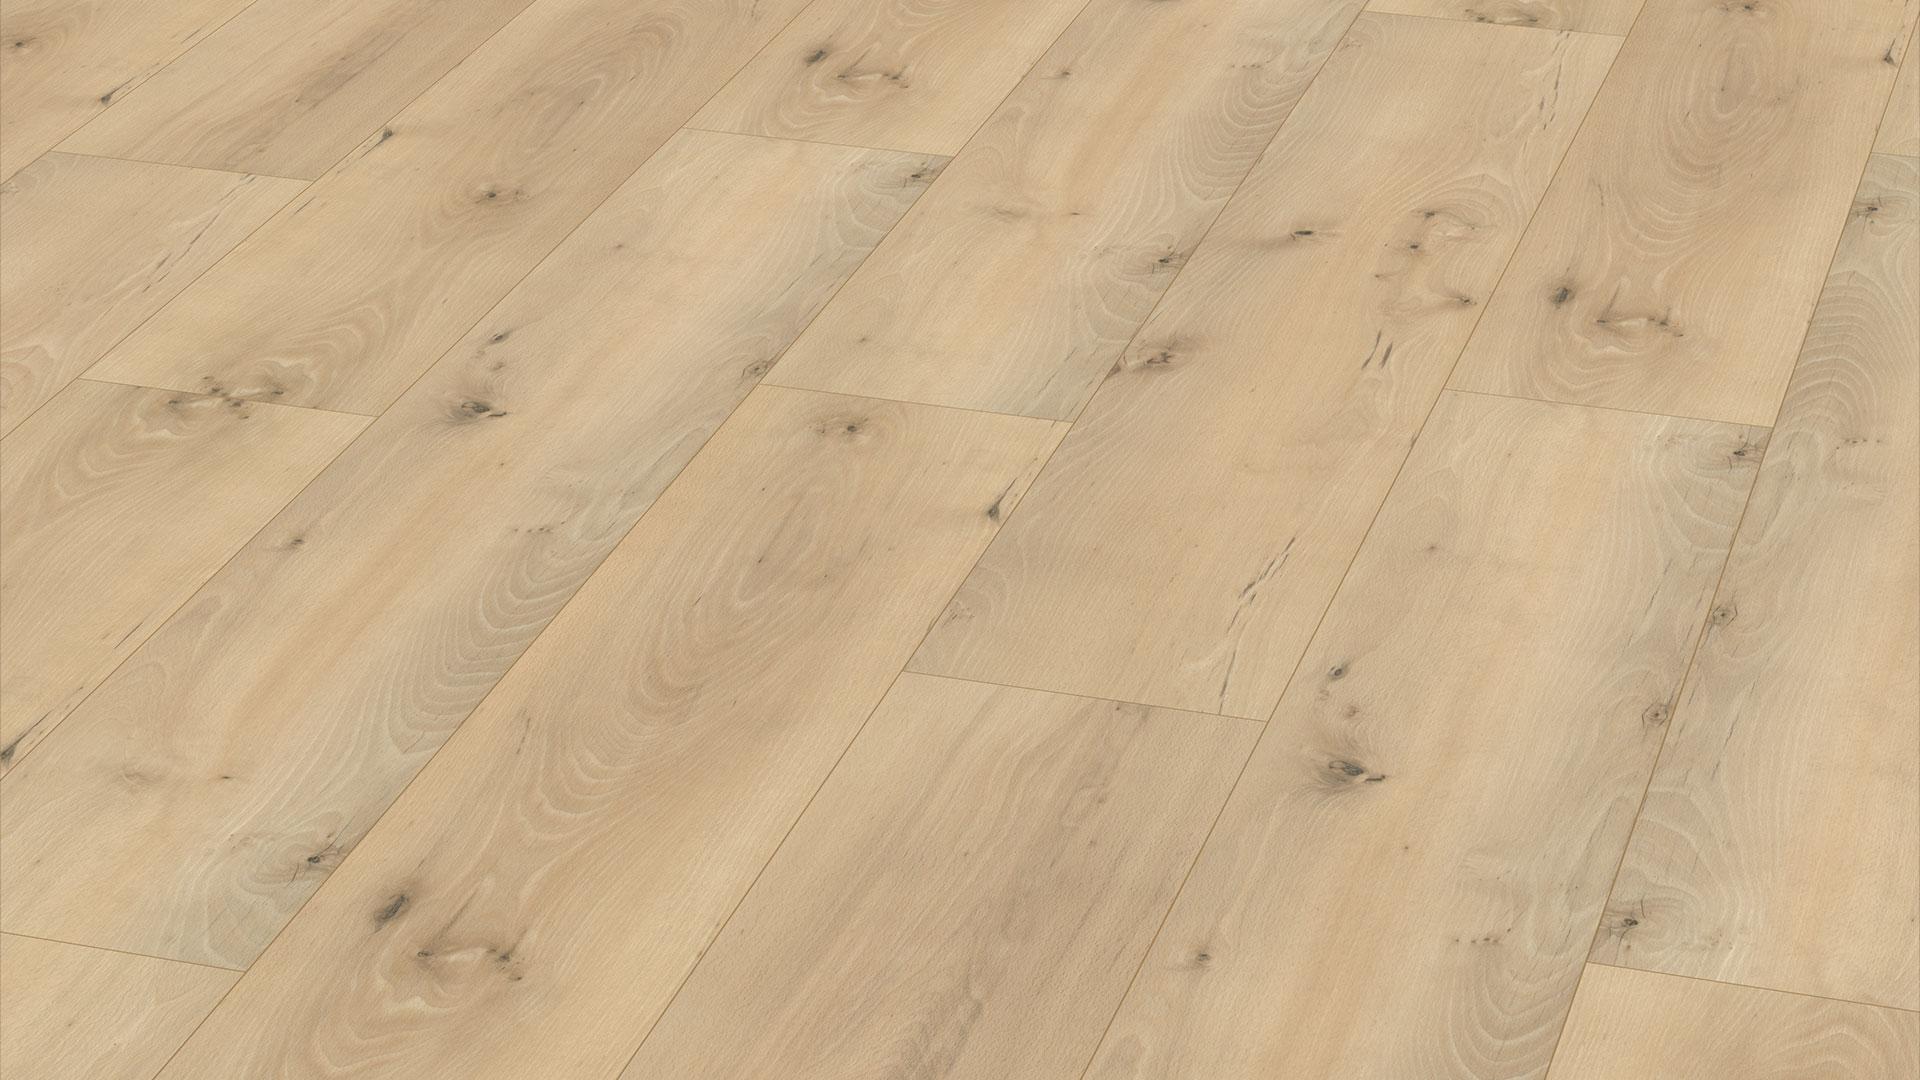 Fußbodenbelag Xl ~ Wood xl pl087c village oak cre designböden sonnhaus purline